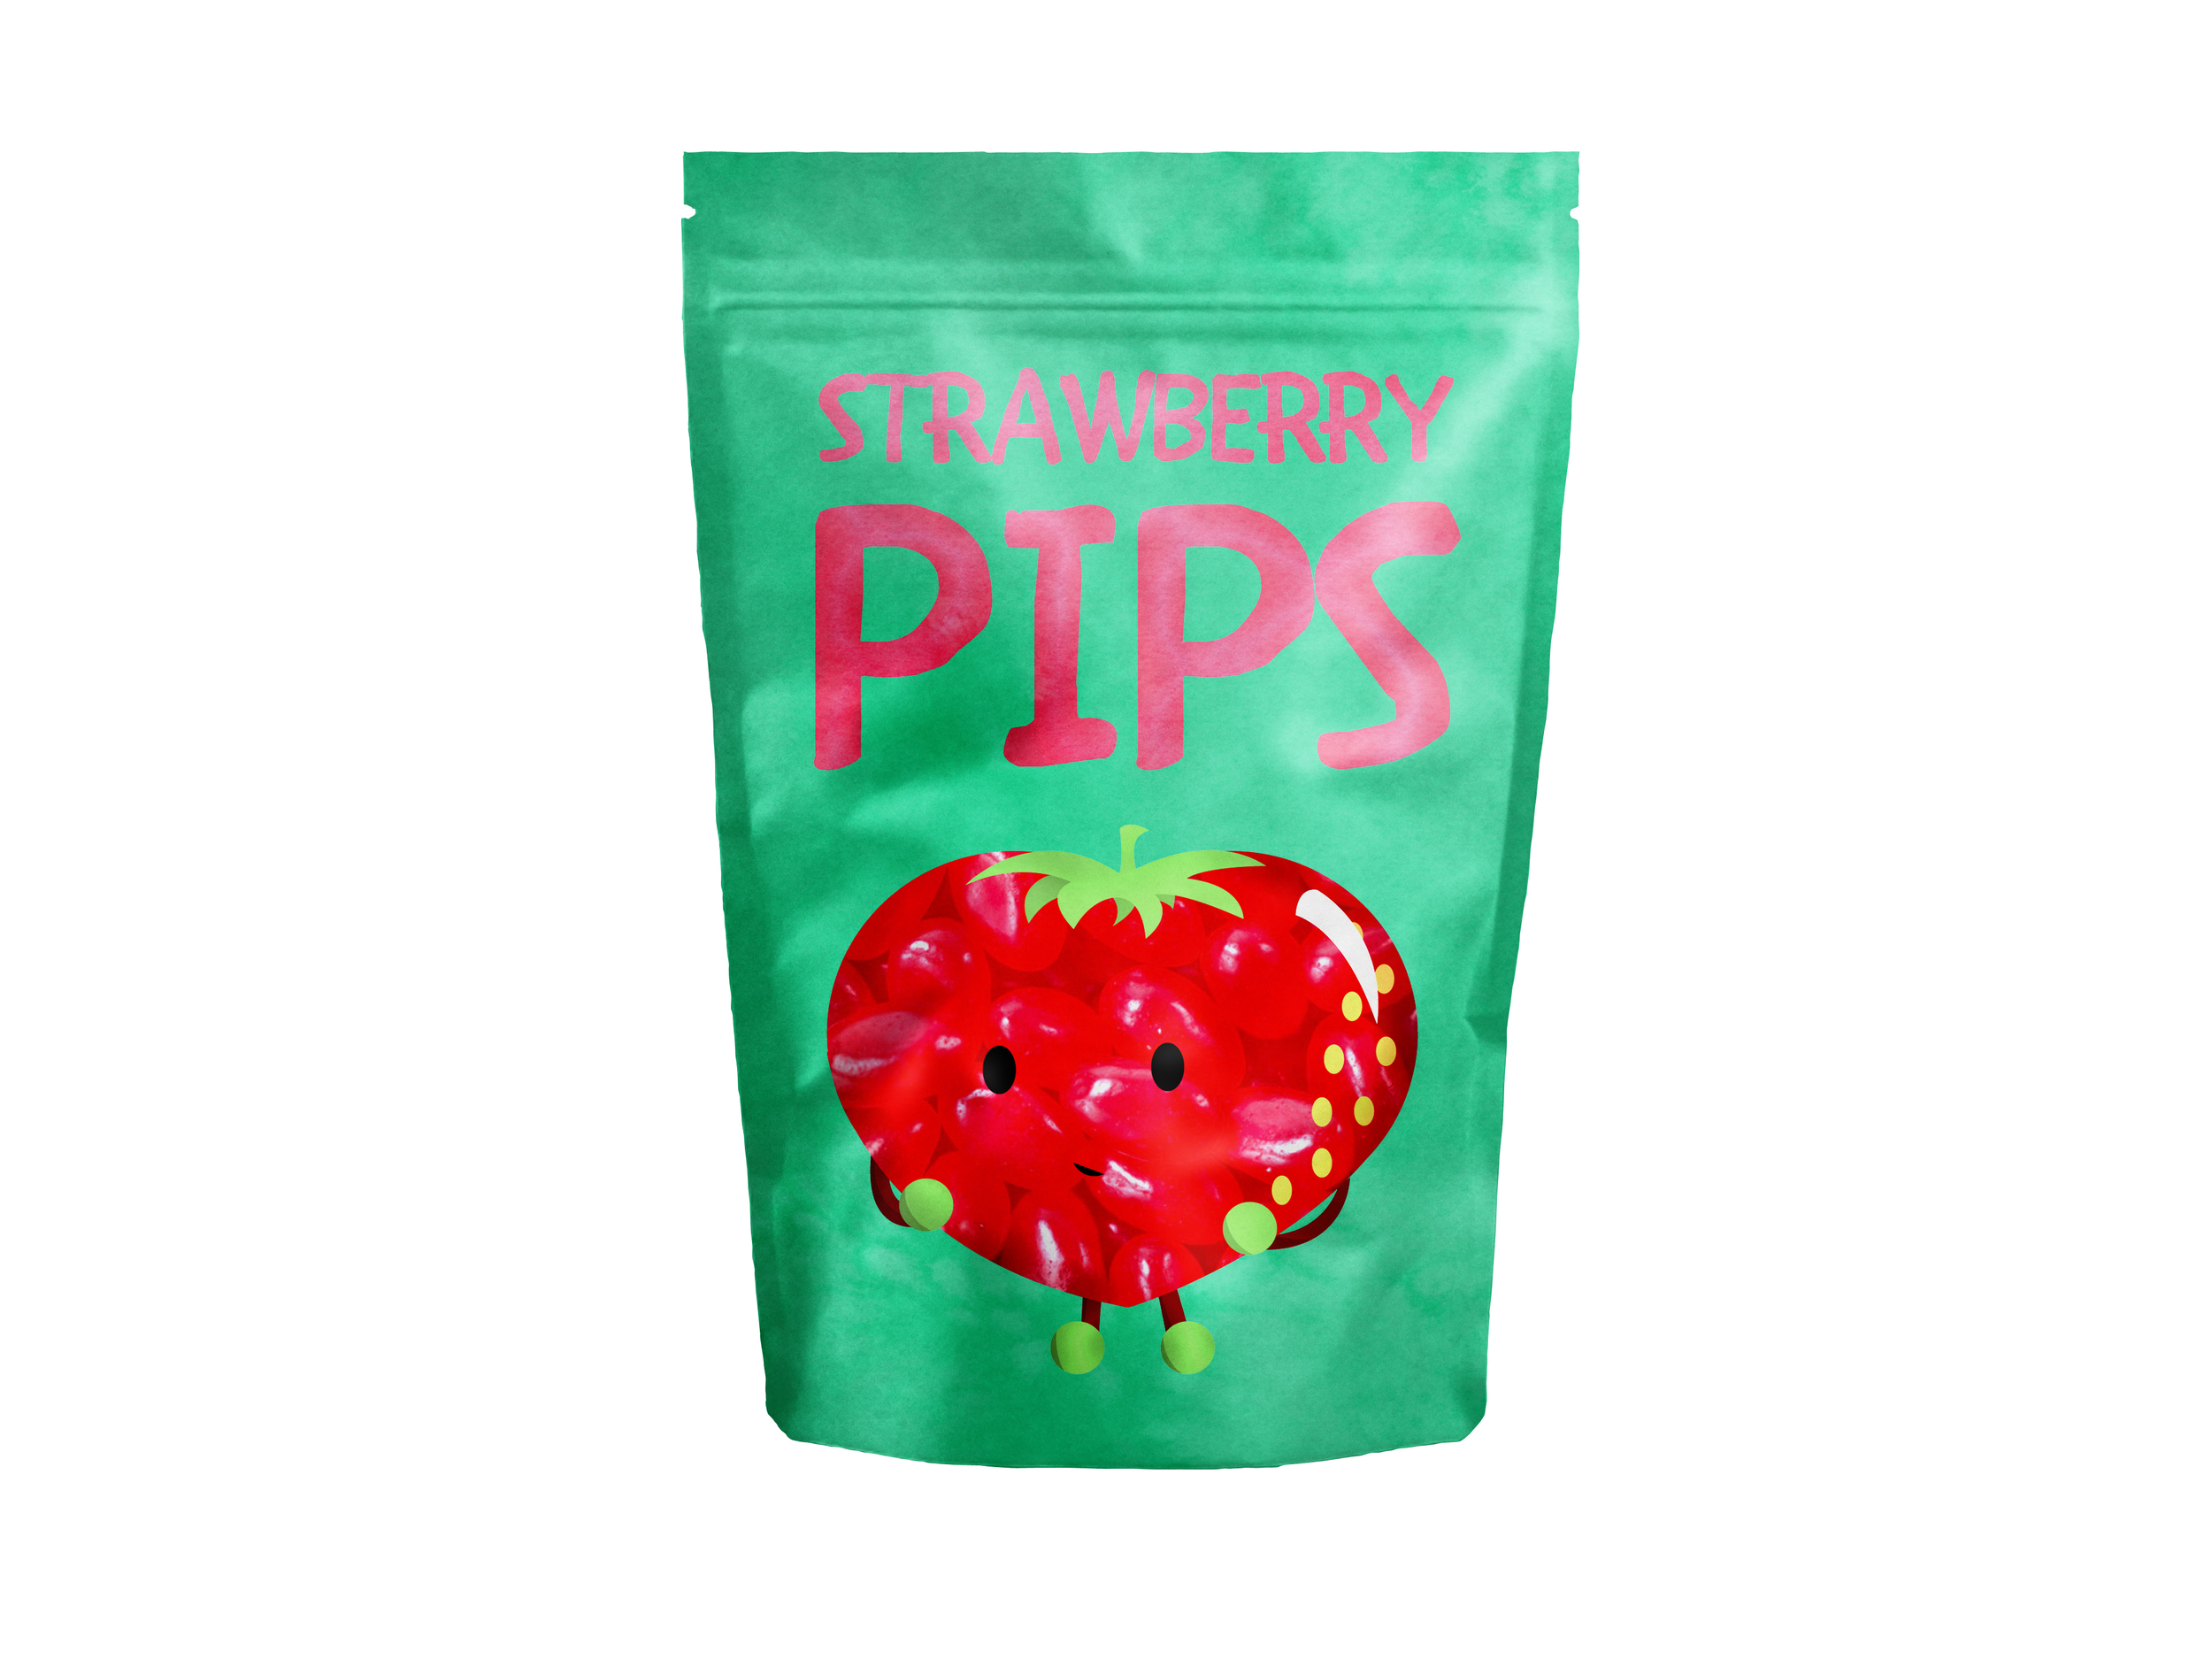 Strawberrybag.jpg